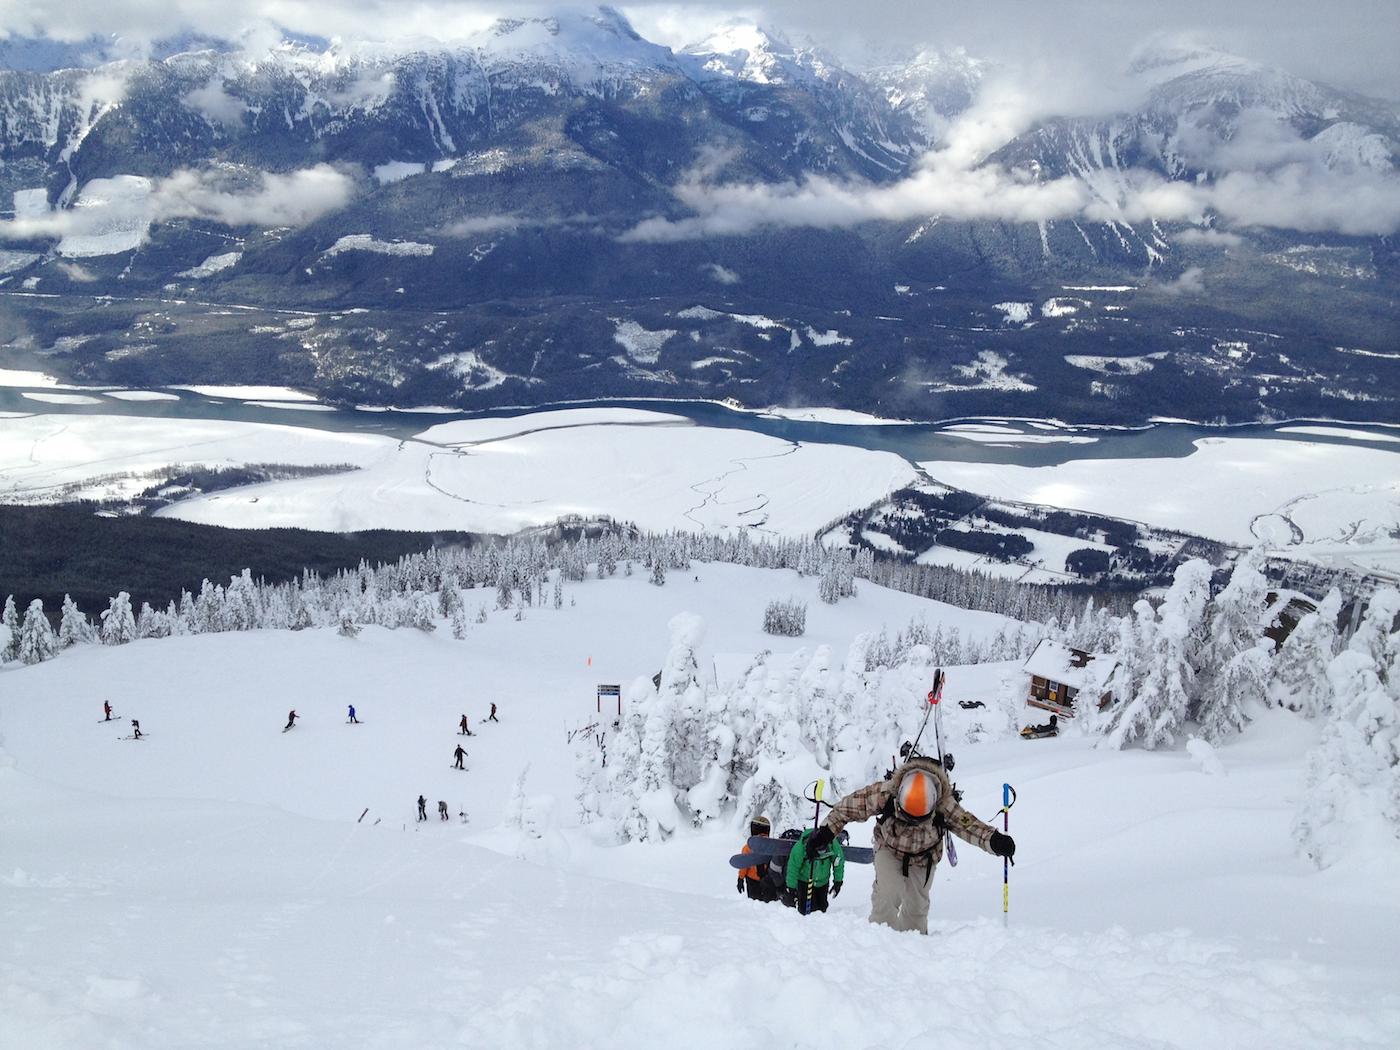 Powder Highway Adventure - GoRVing Canada